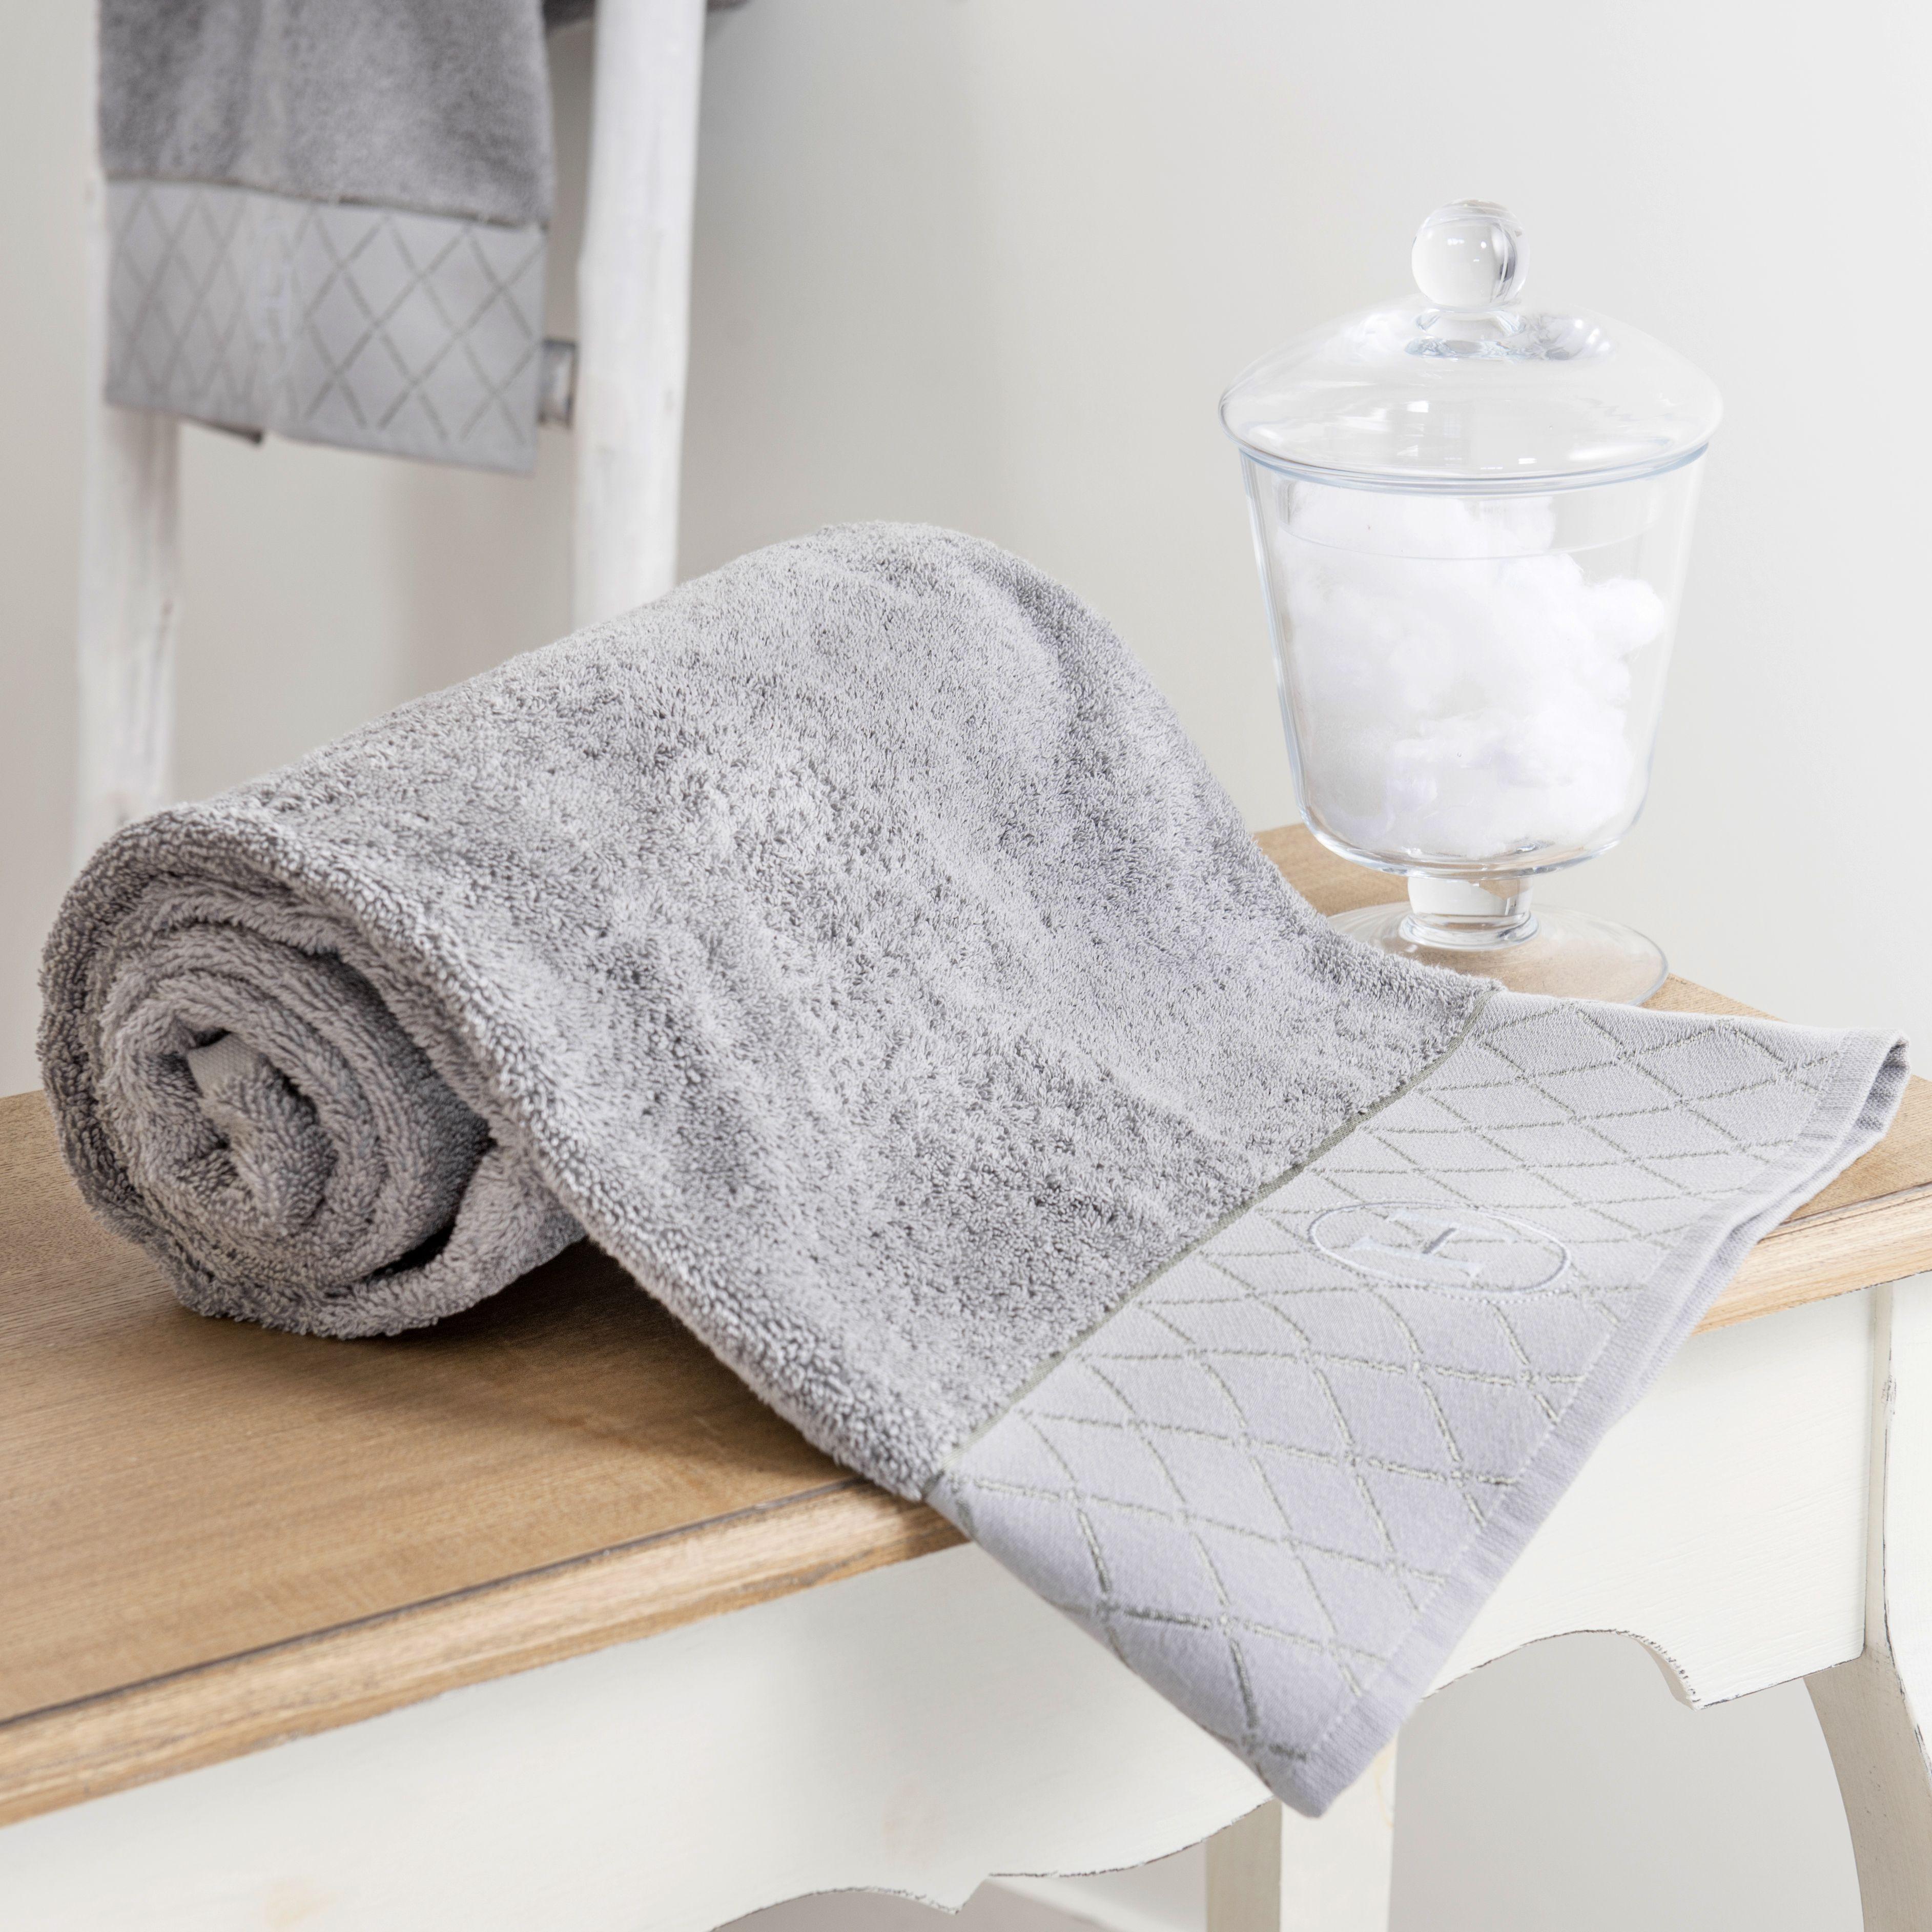 Badetuch HÔTEL aus Baumwolle, 70 x 140 cm, grau | Marcel | Pinterest ...